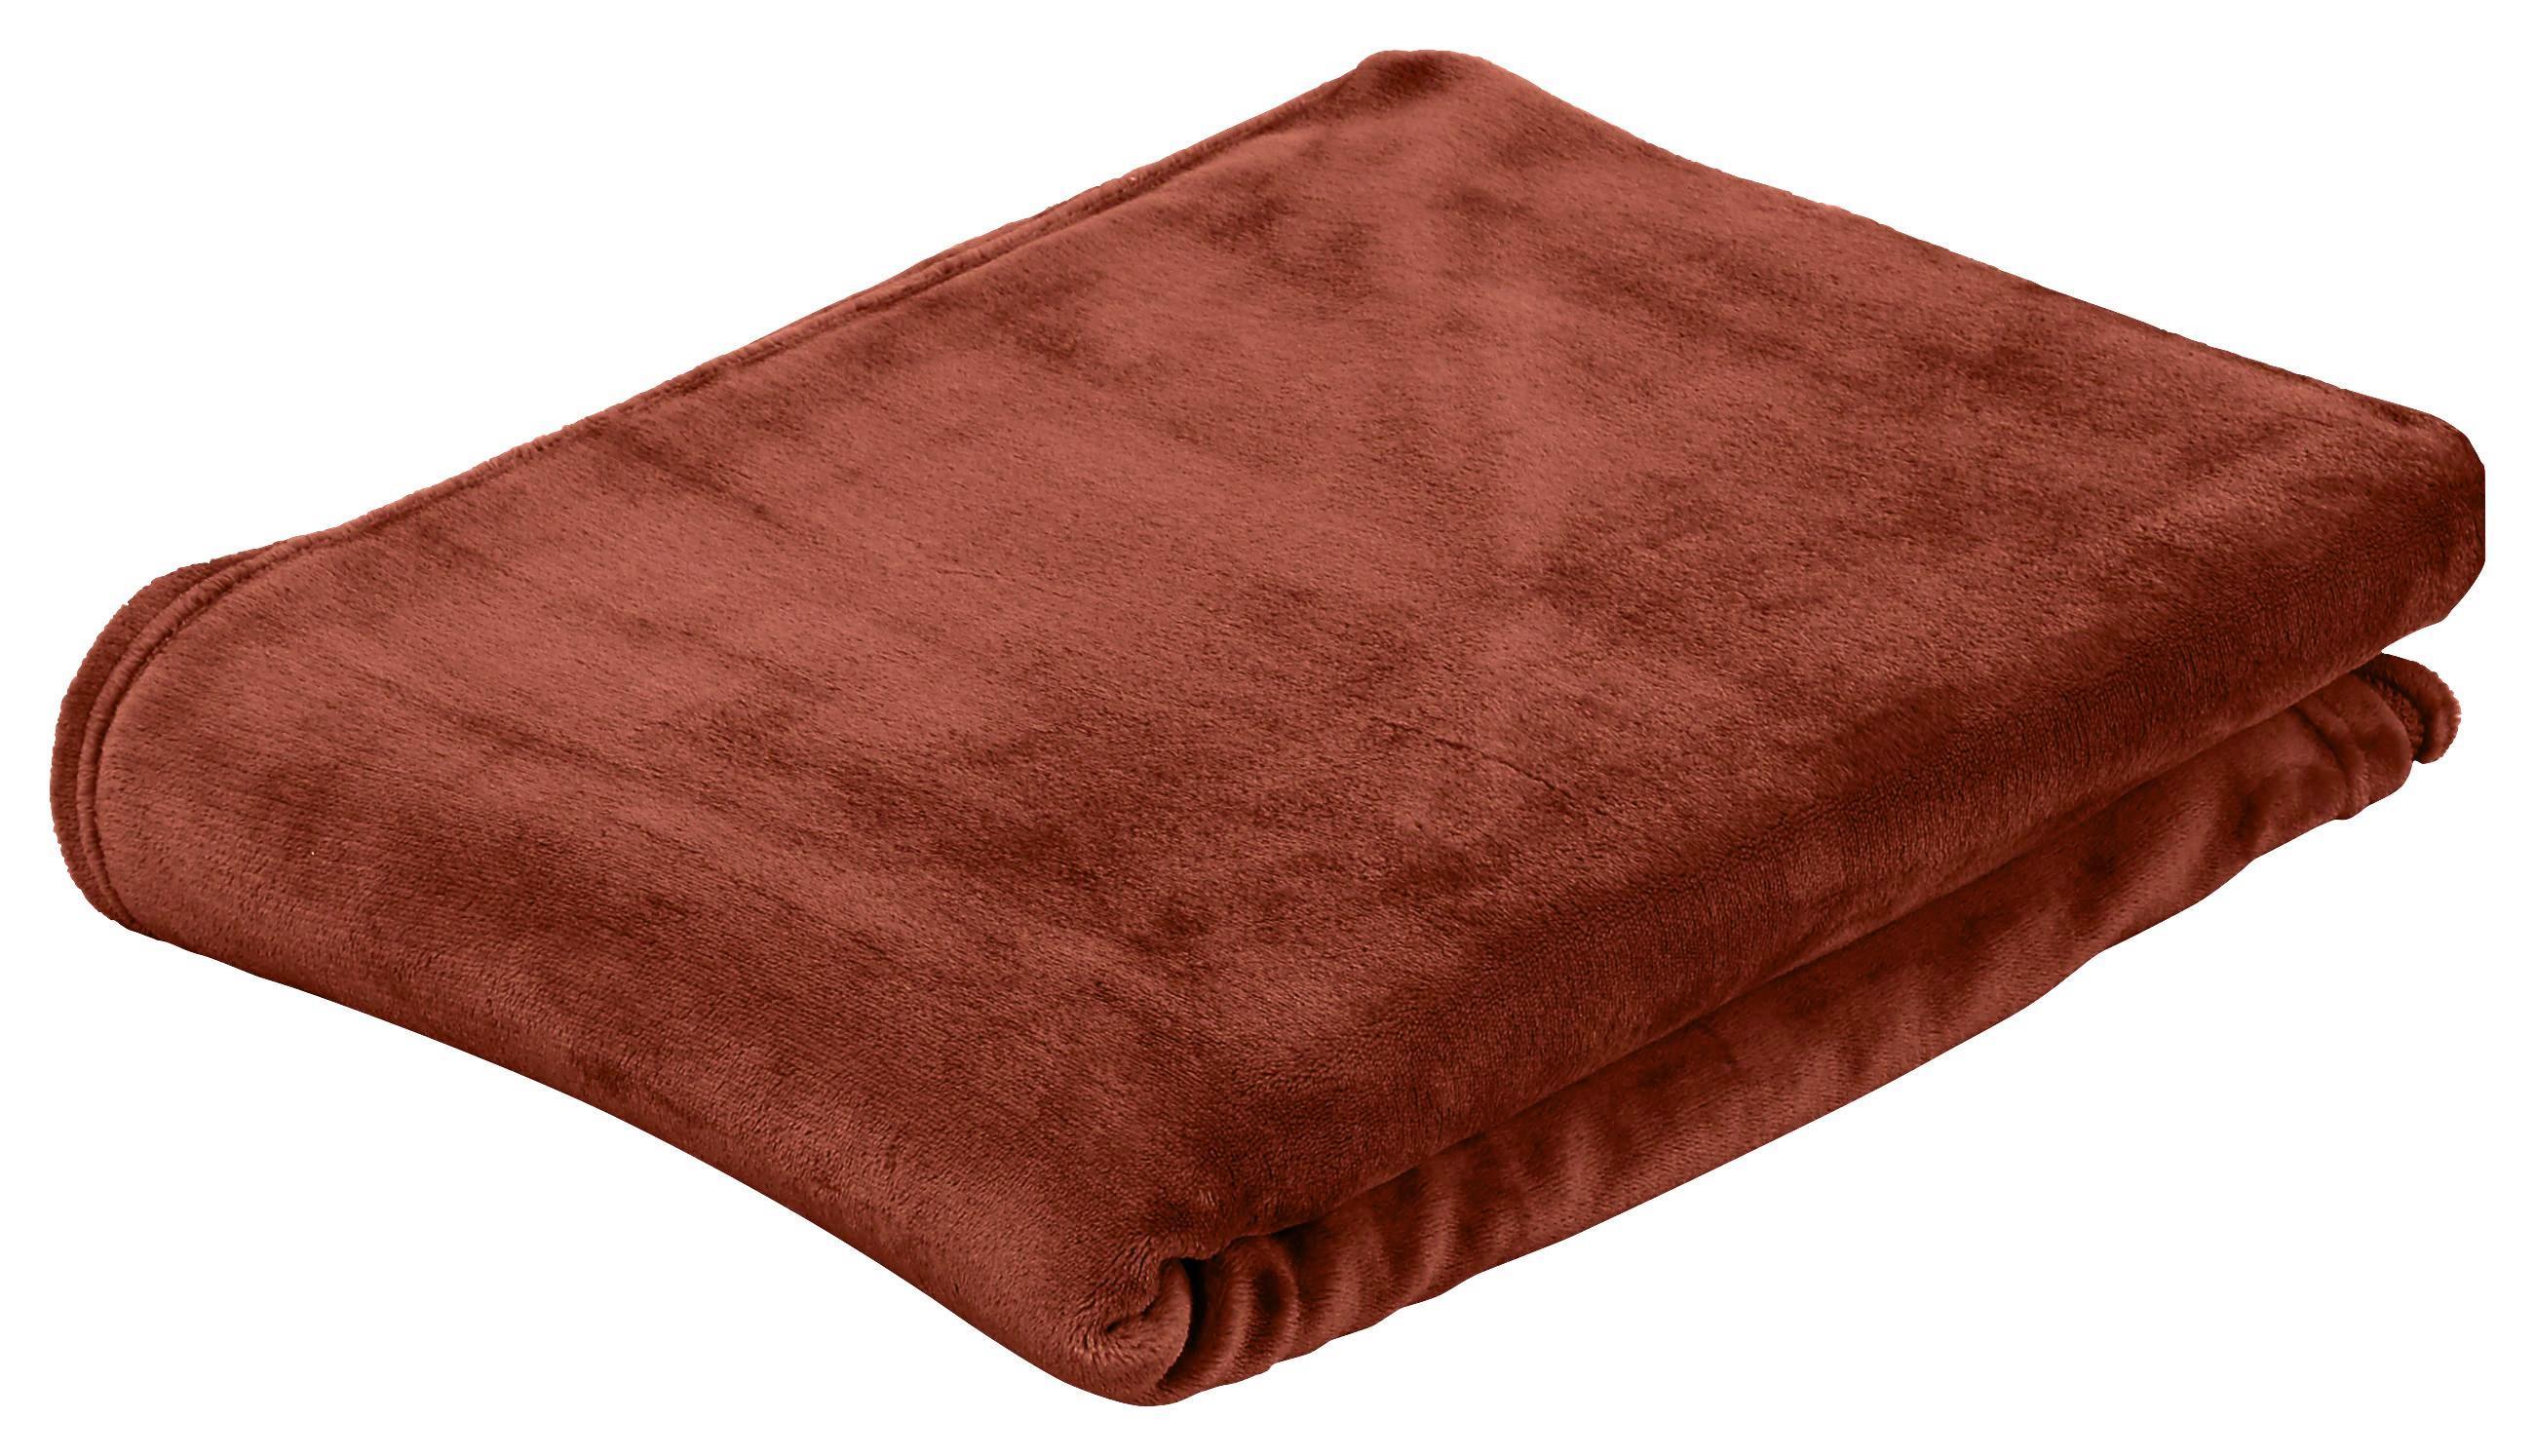 Puha Takaró Marlies I - barna, konvencionális, textil (220/240cm) - LUCA BESSONI